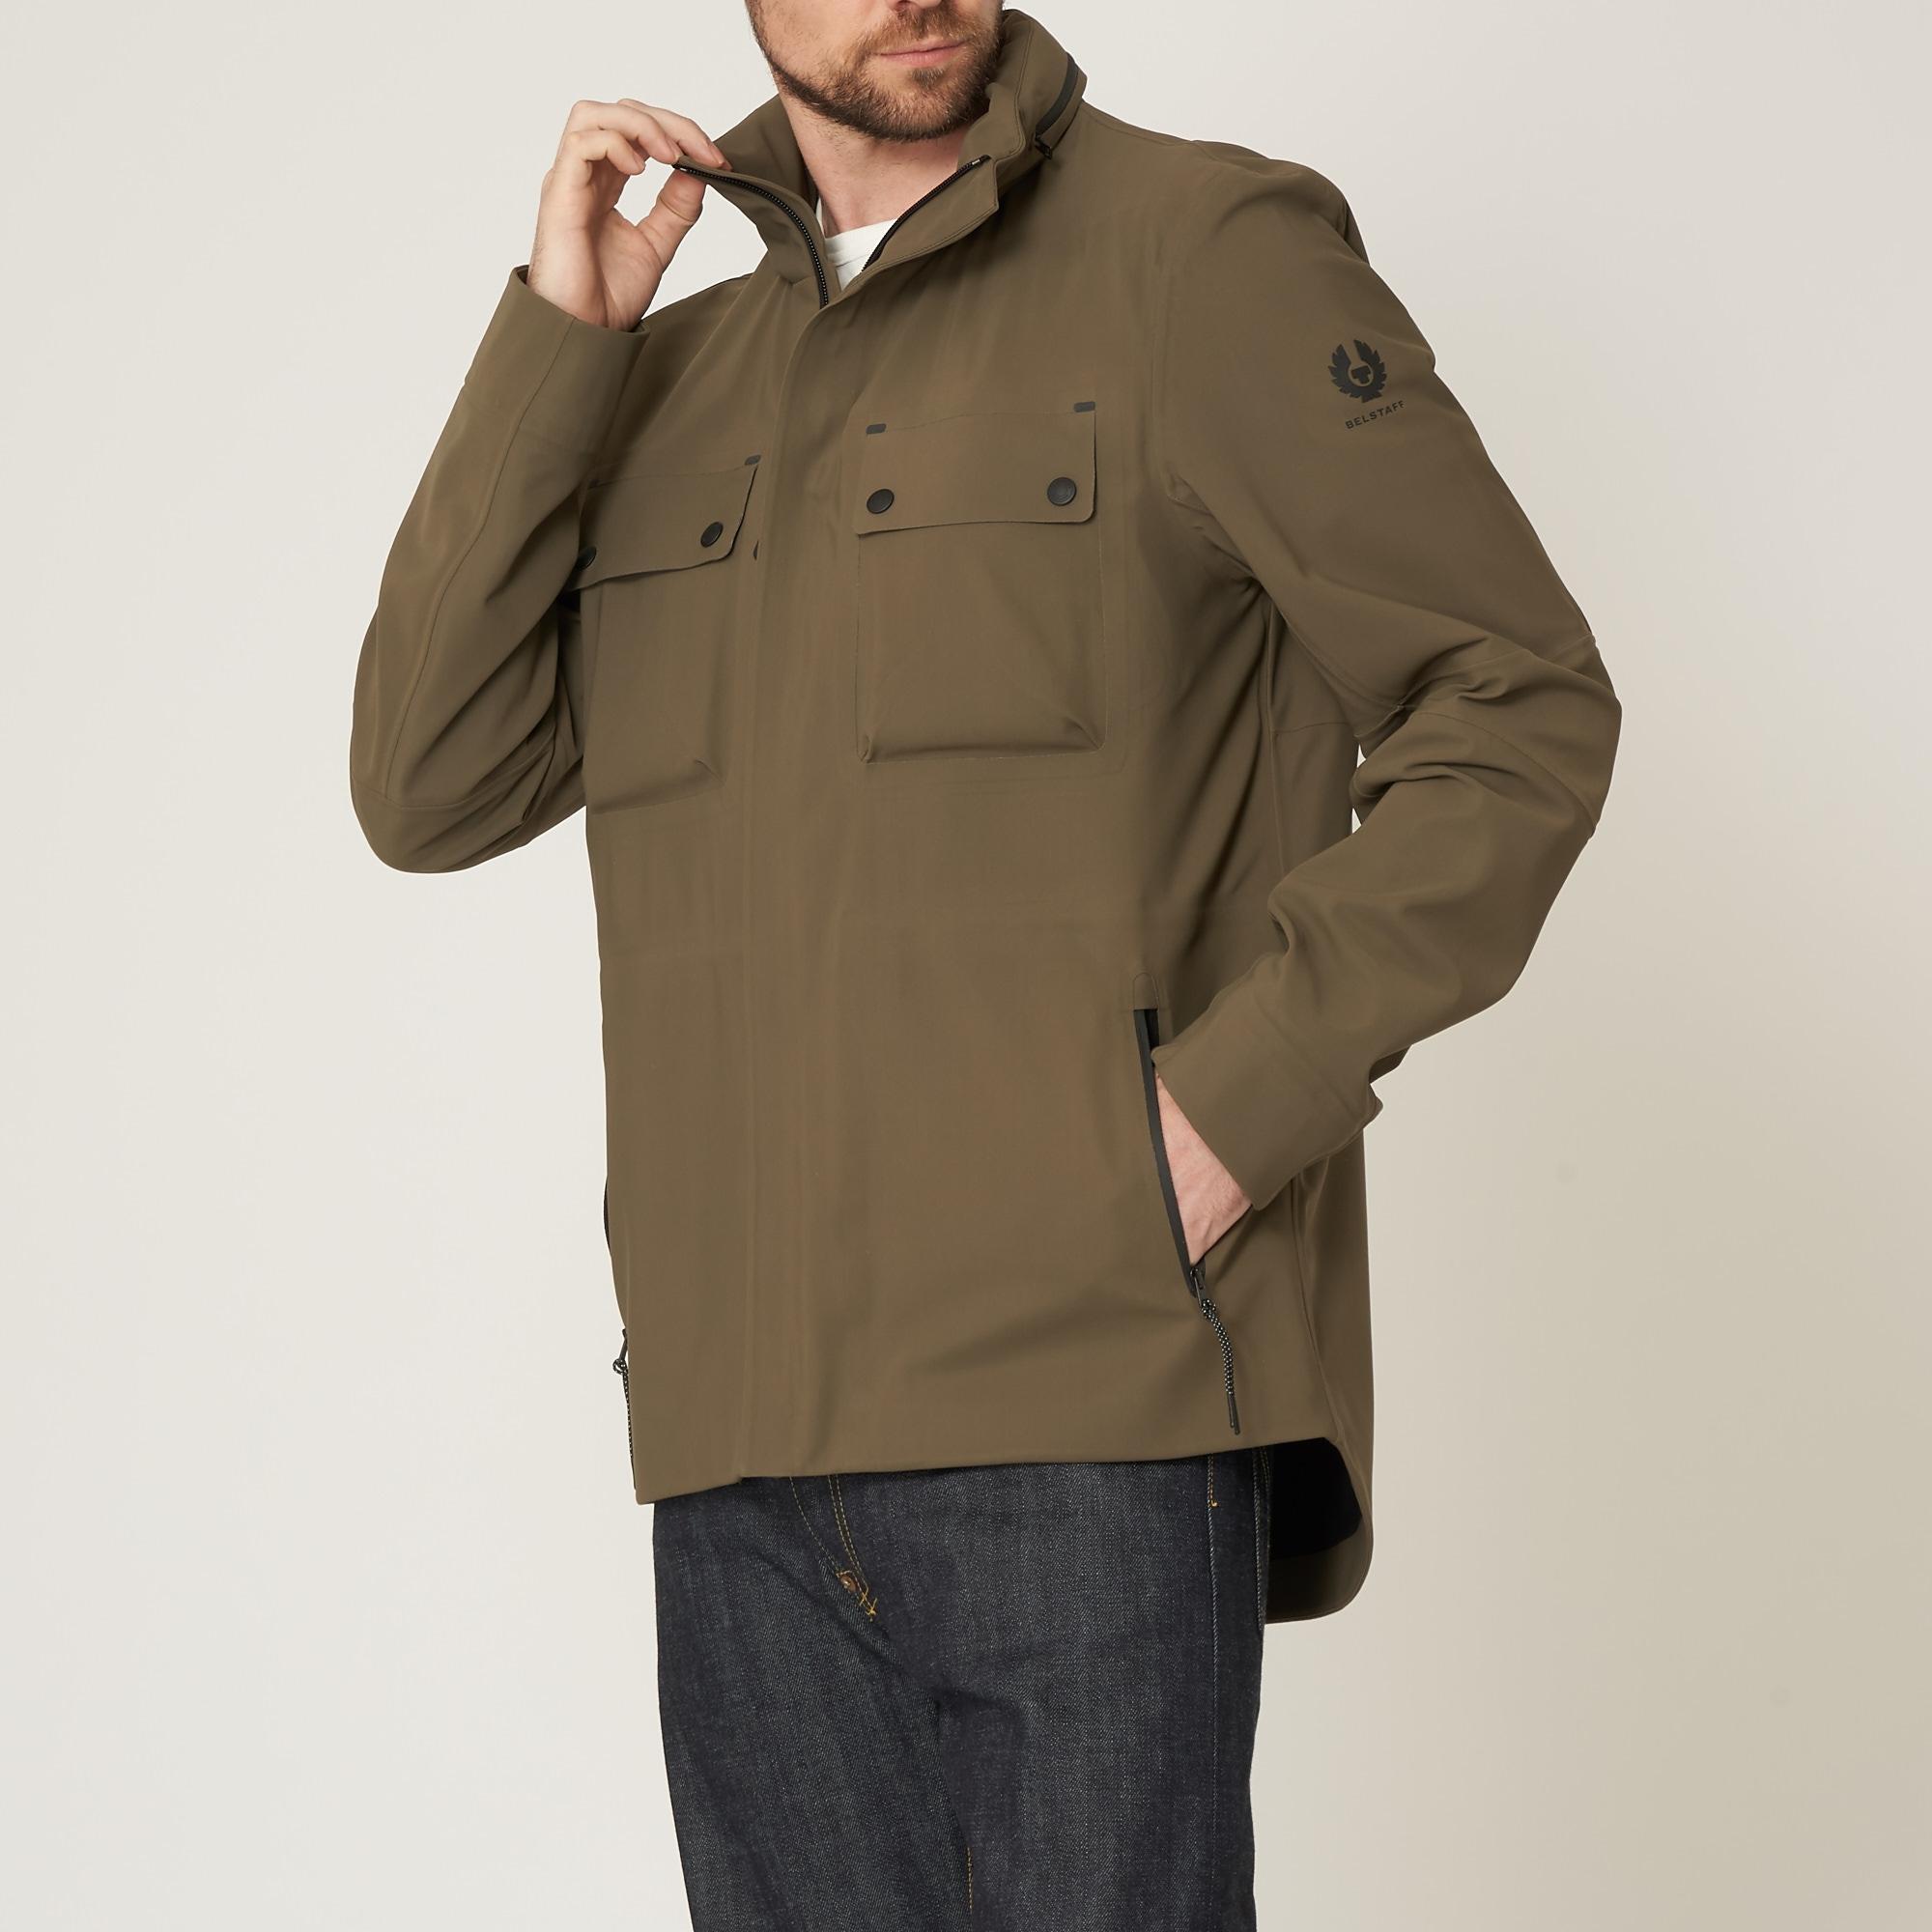 865e37d274b5 Lyst - Belstaff Slipstream Jacket for Men